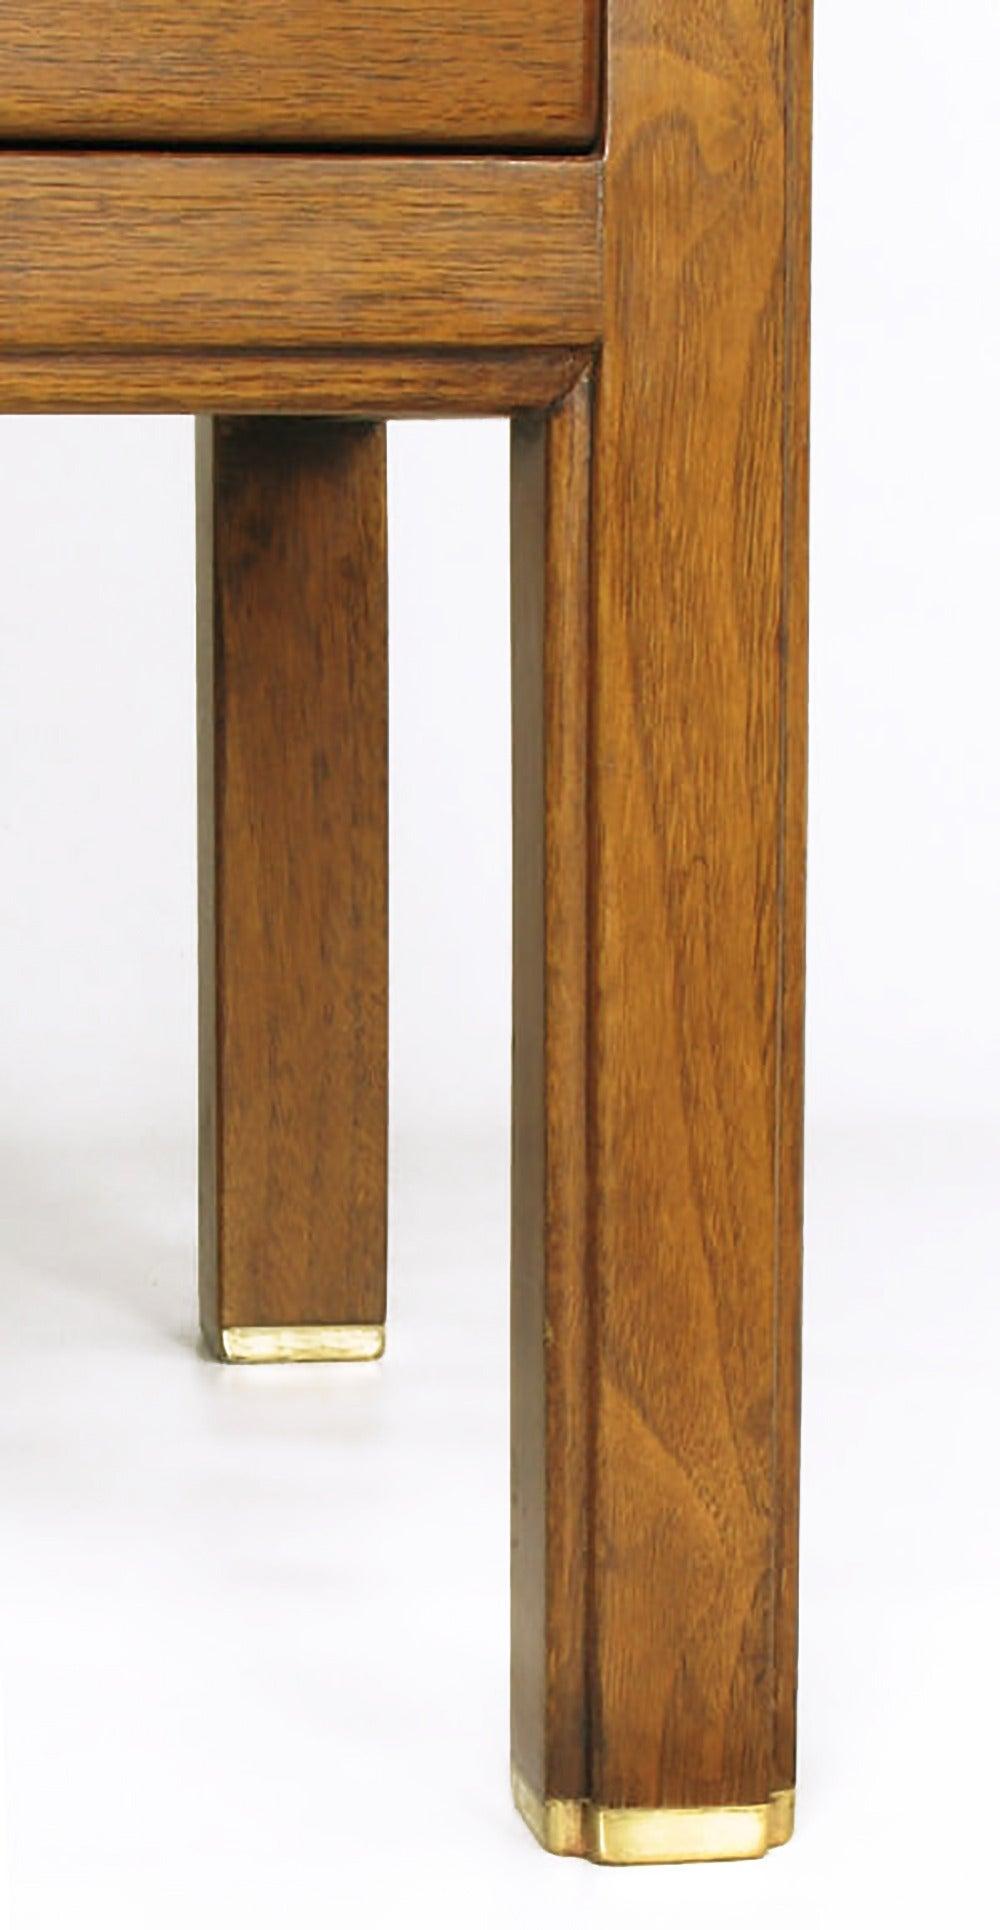 Edward Wormley Mahogany Sideboard Cabinet With Sliding